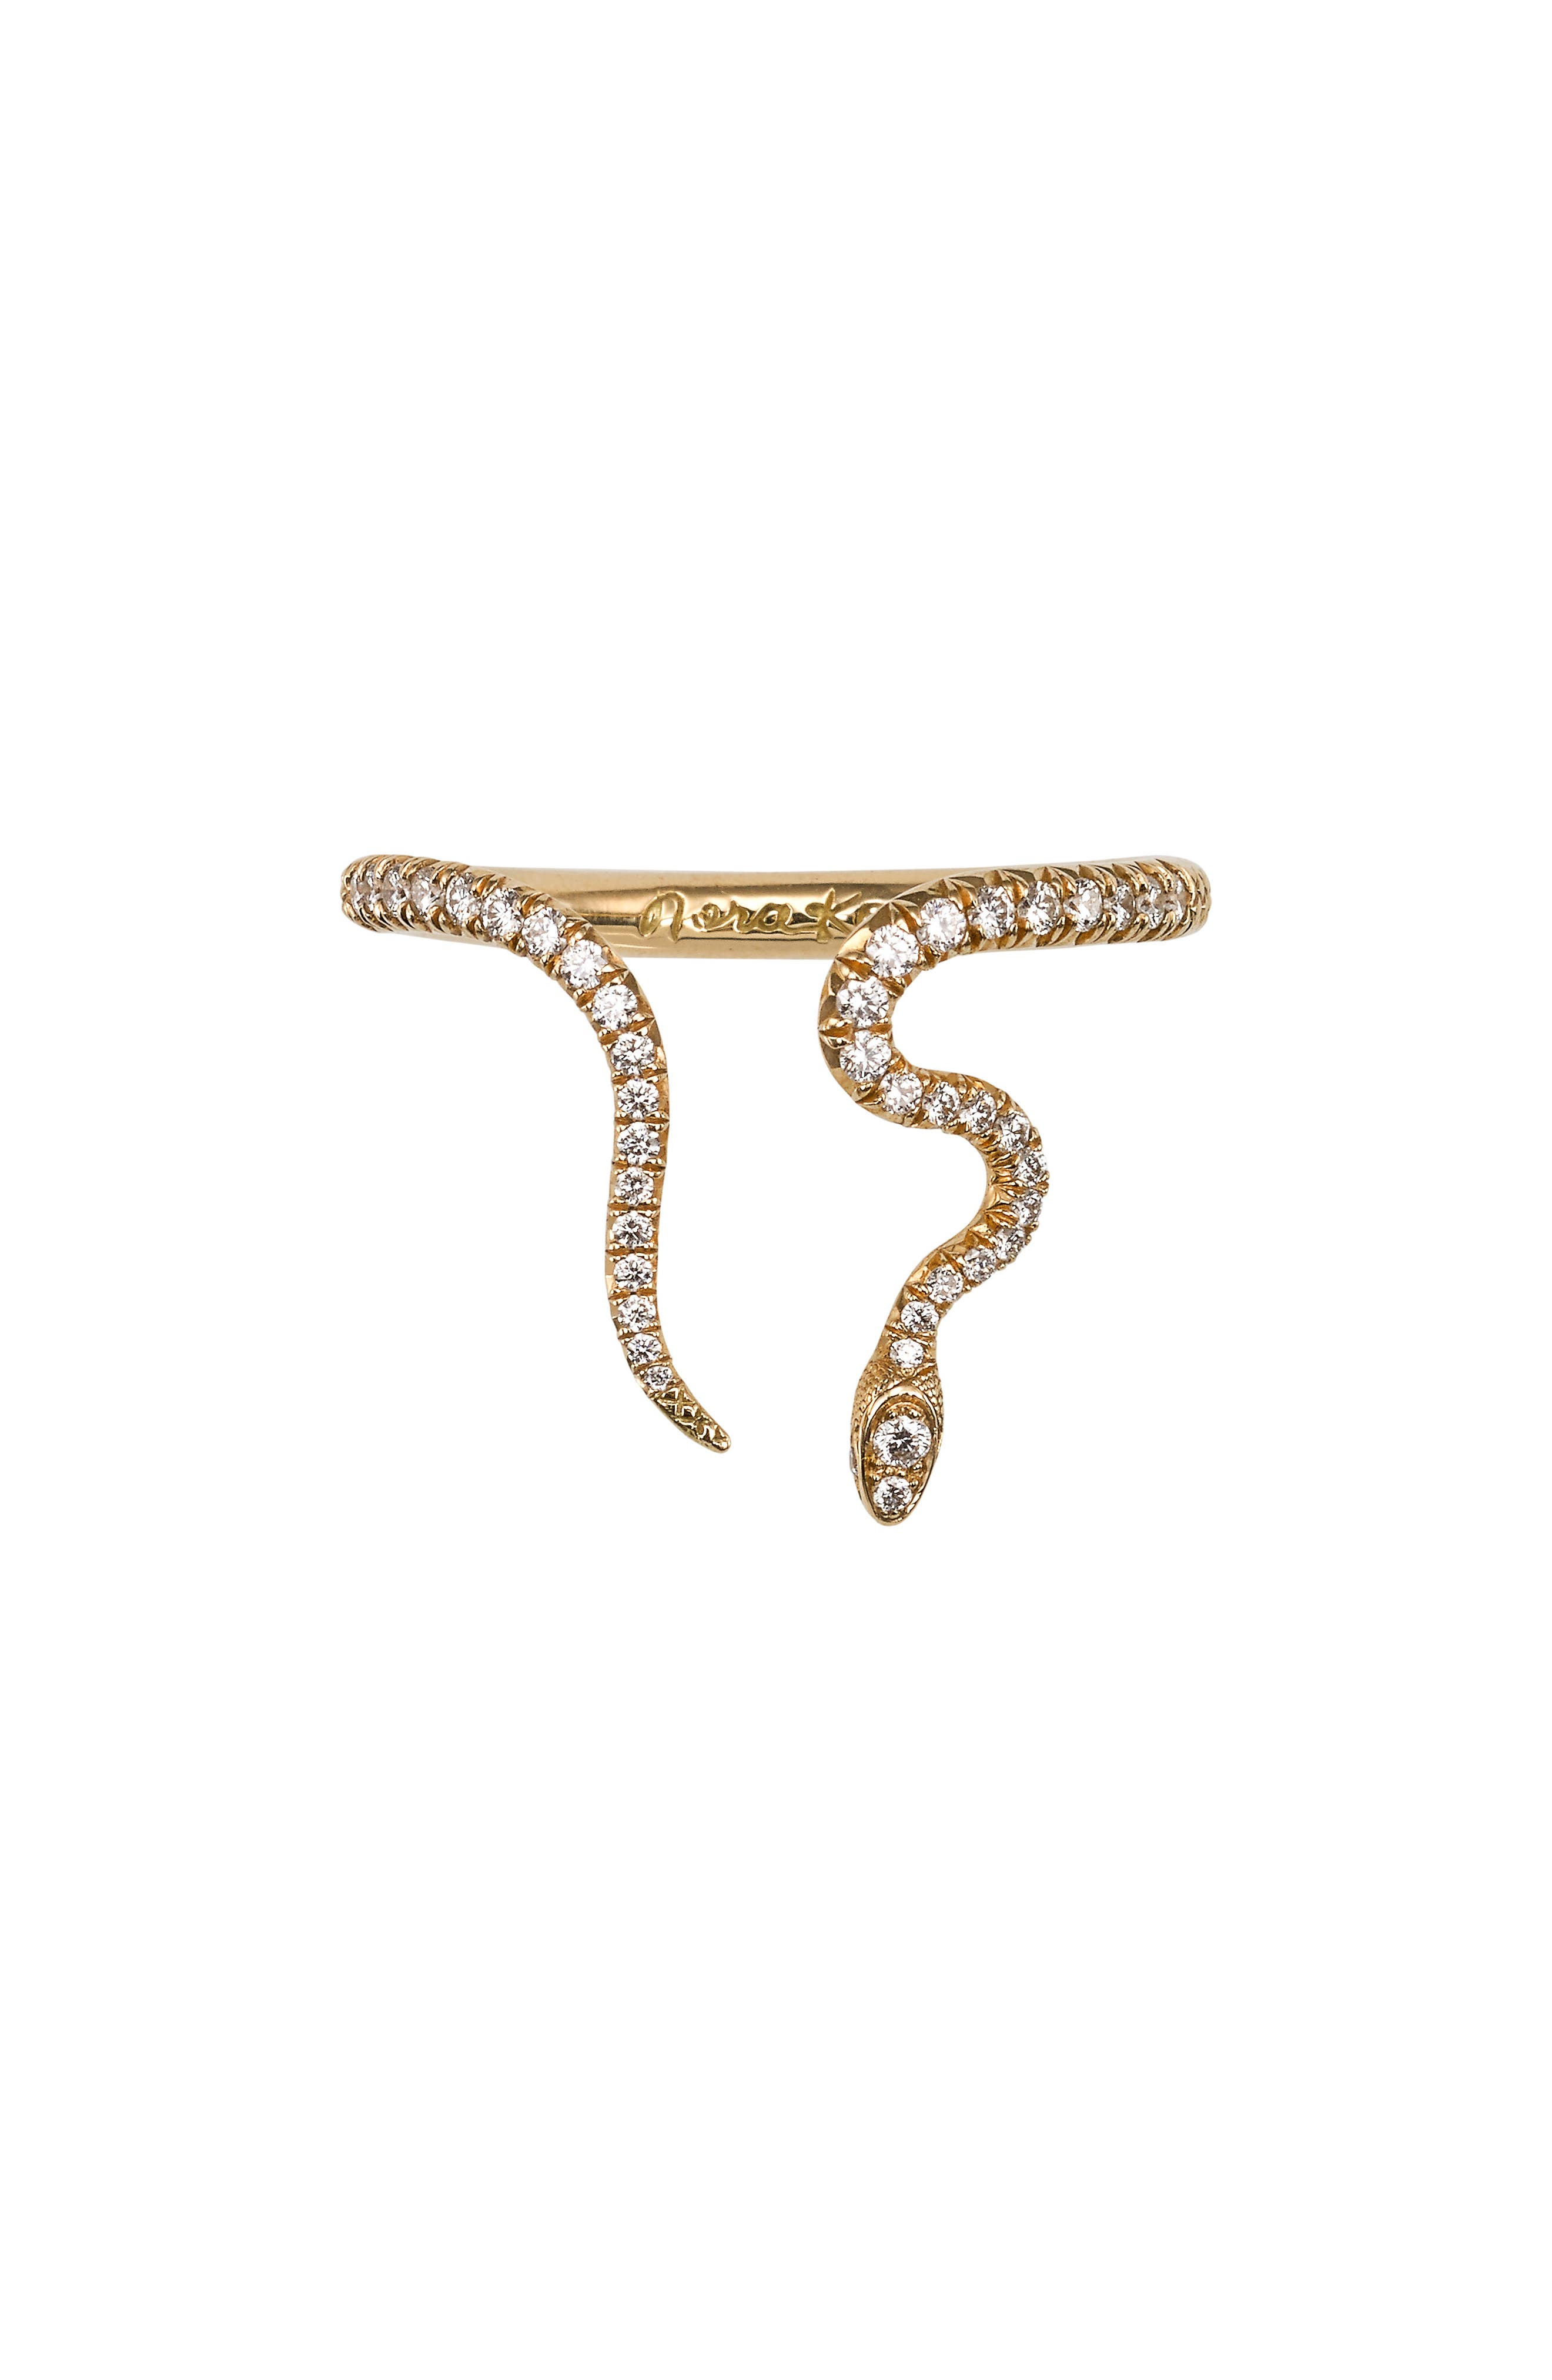 Alexandra Diamond Open Snake Ring,                             Main thumbnail 1, color,                             YELLOW GOLD